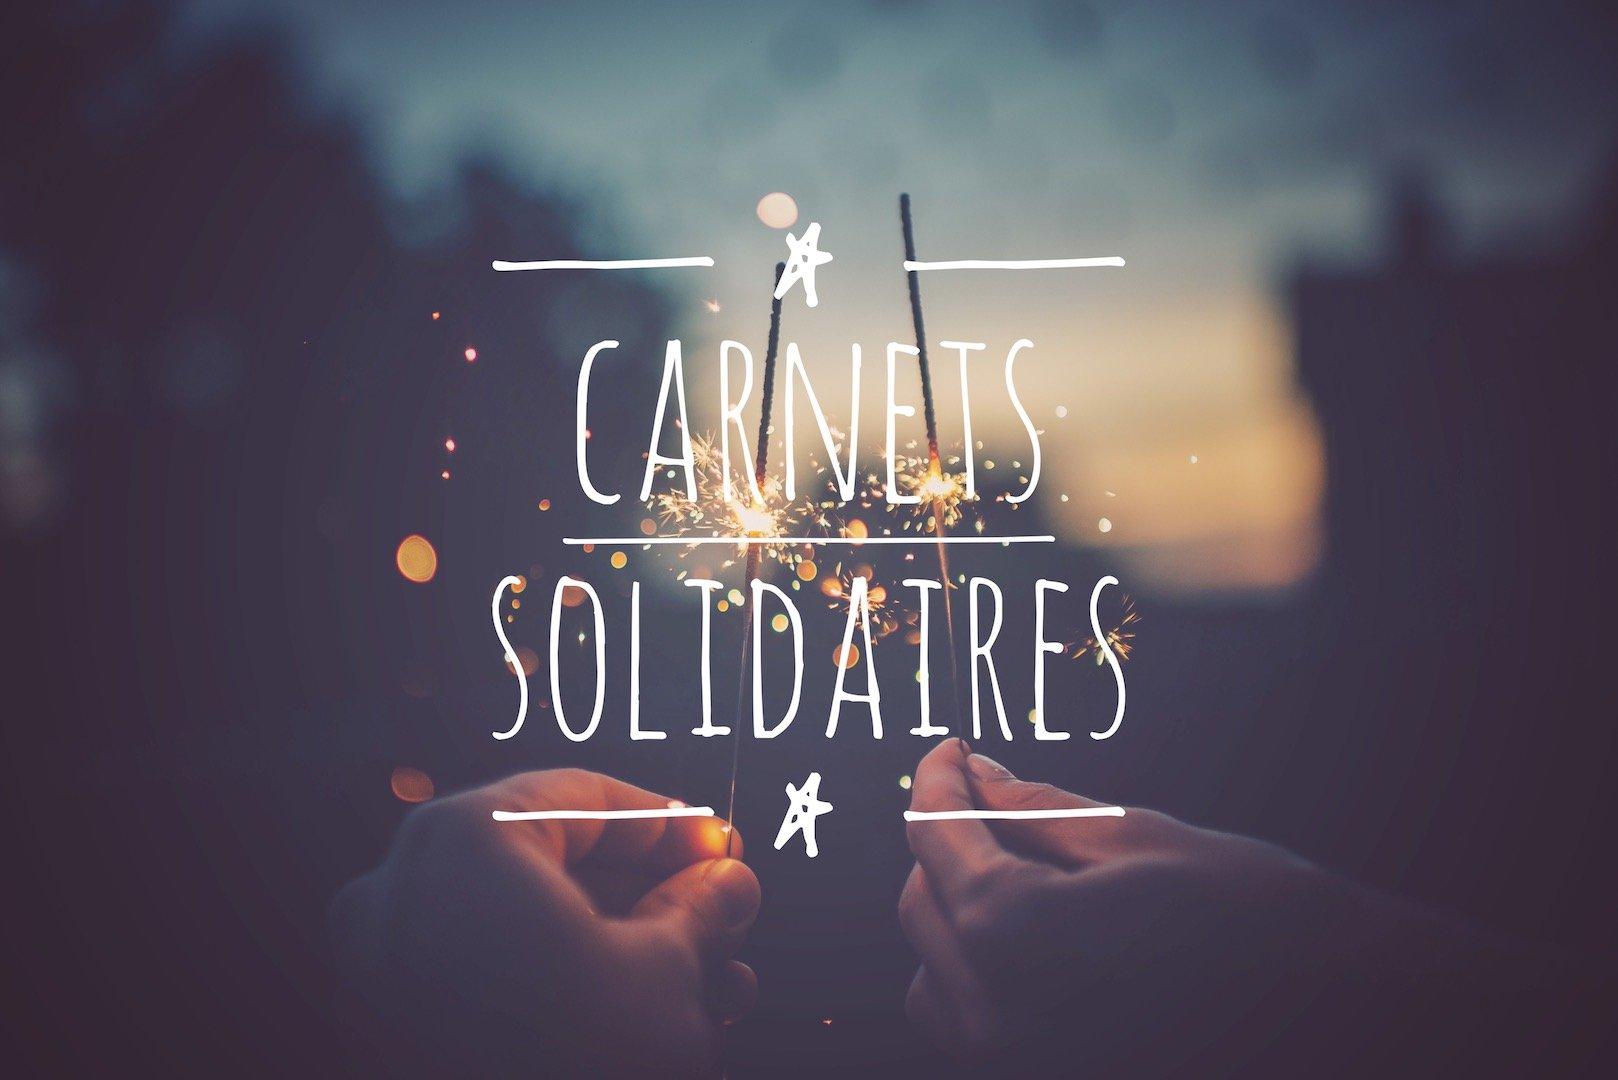 Congés solidaires - Blog de Voyage